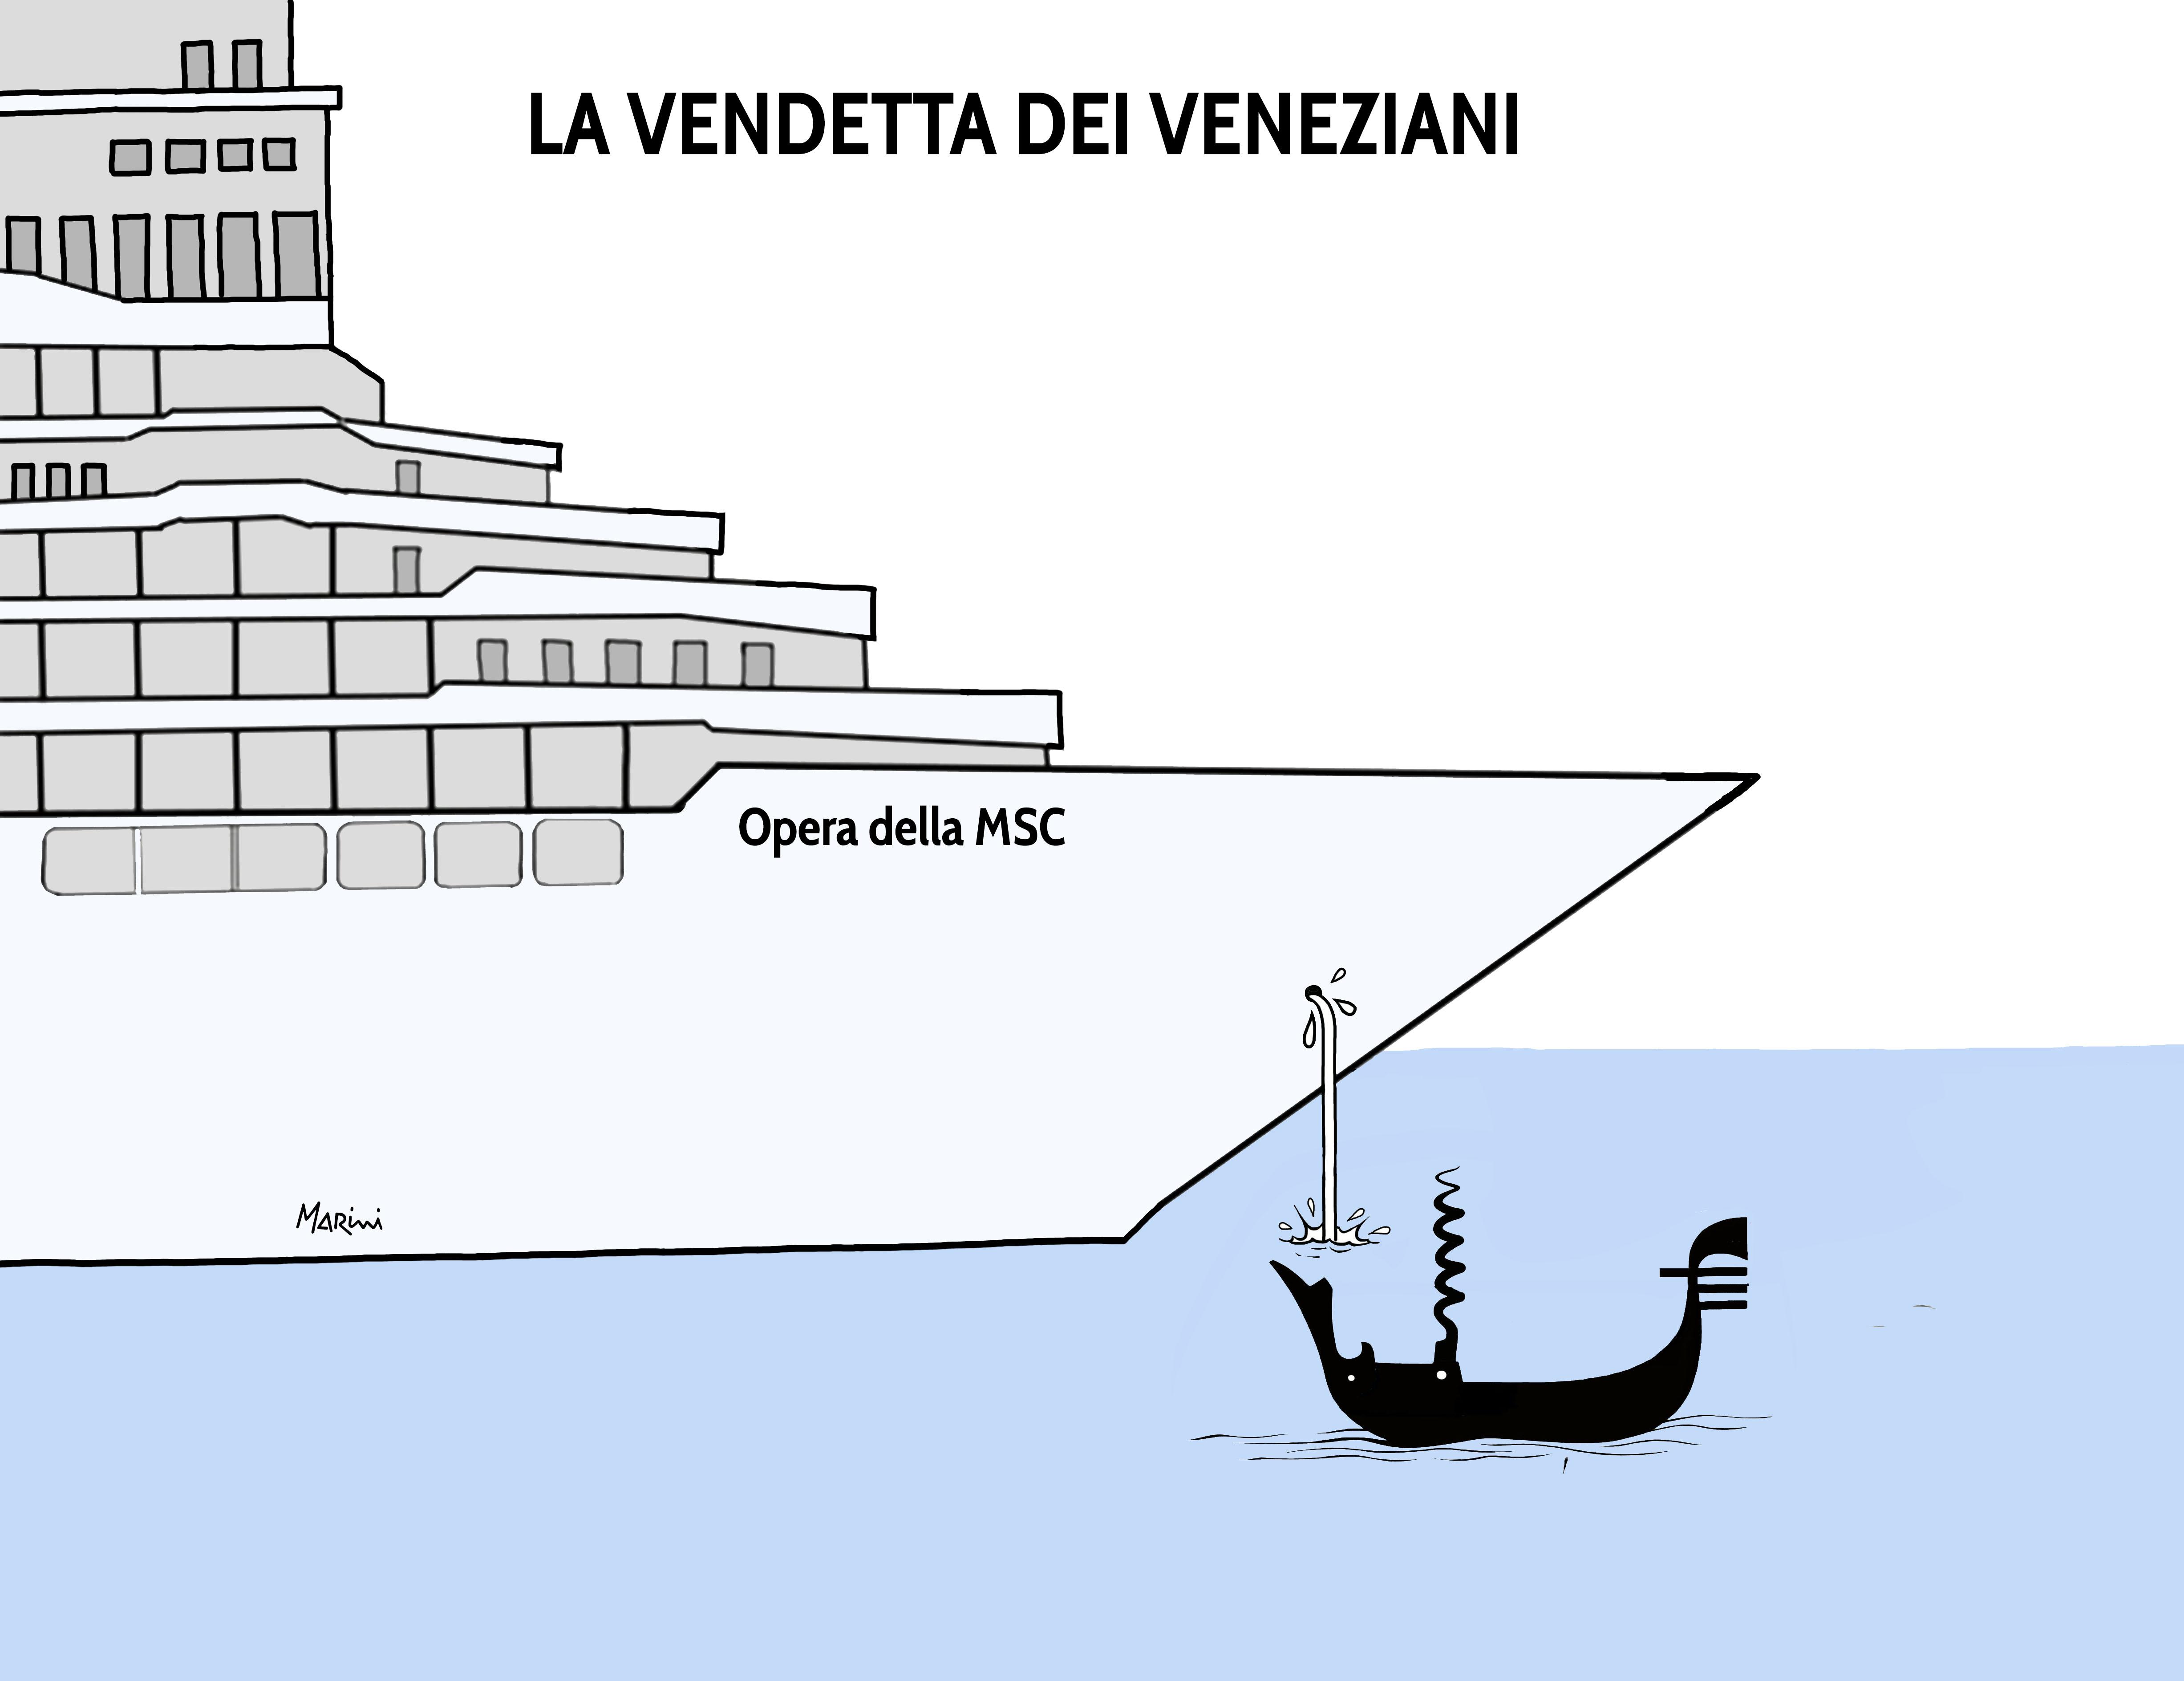 venezia crociera laguna marini